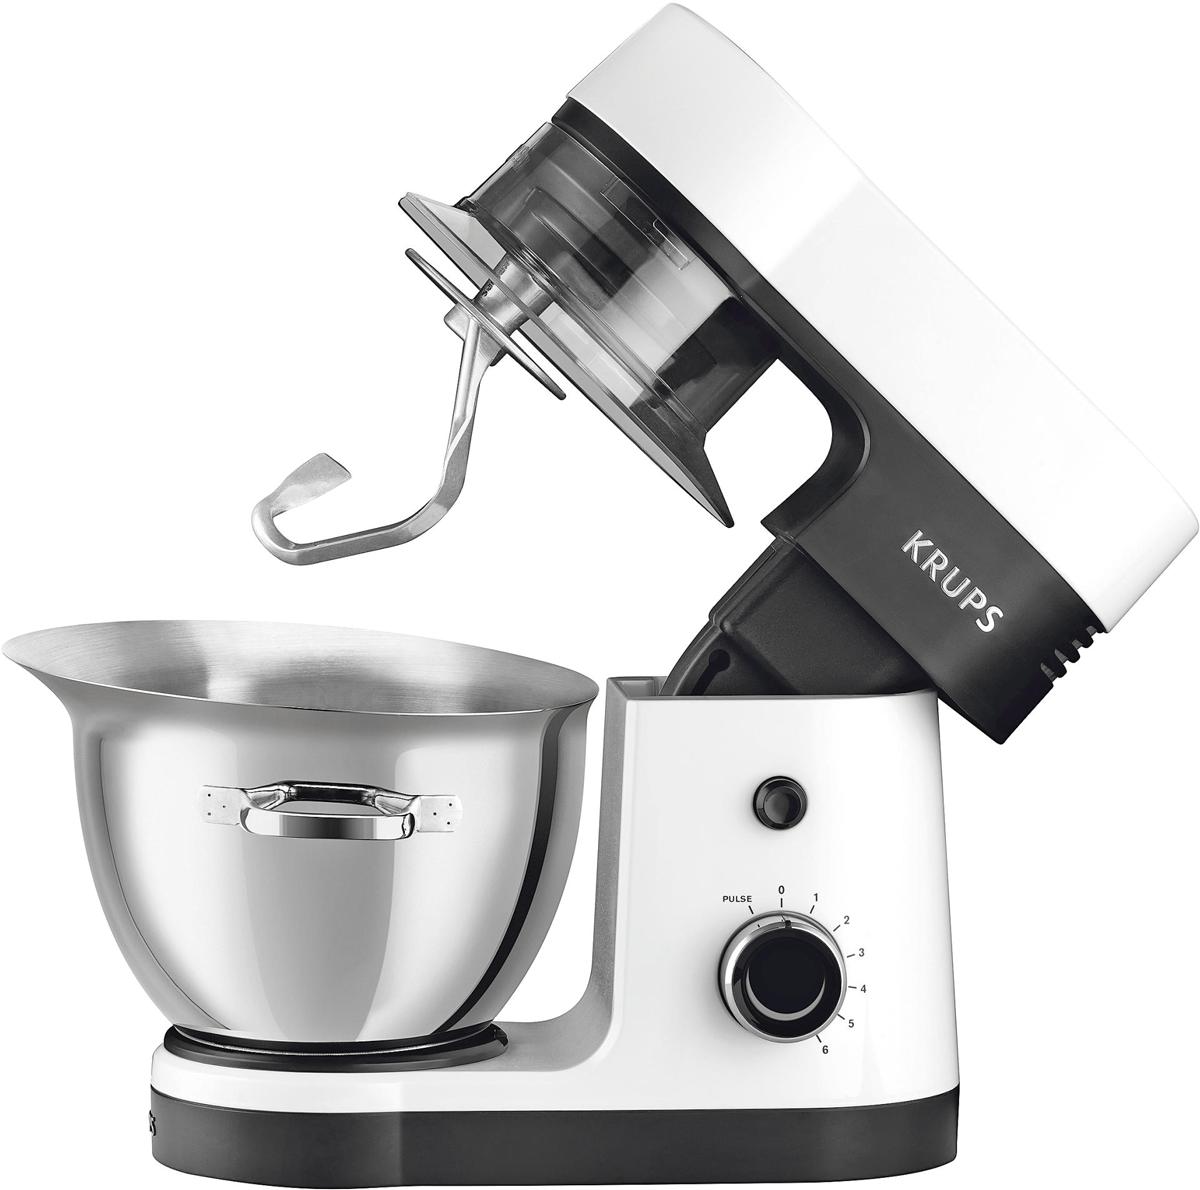 Krups perfect mix 9000 robot de cuisine 6 vitesses for Acheter ustensiles de cuisine